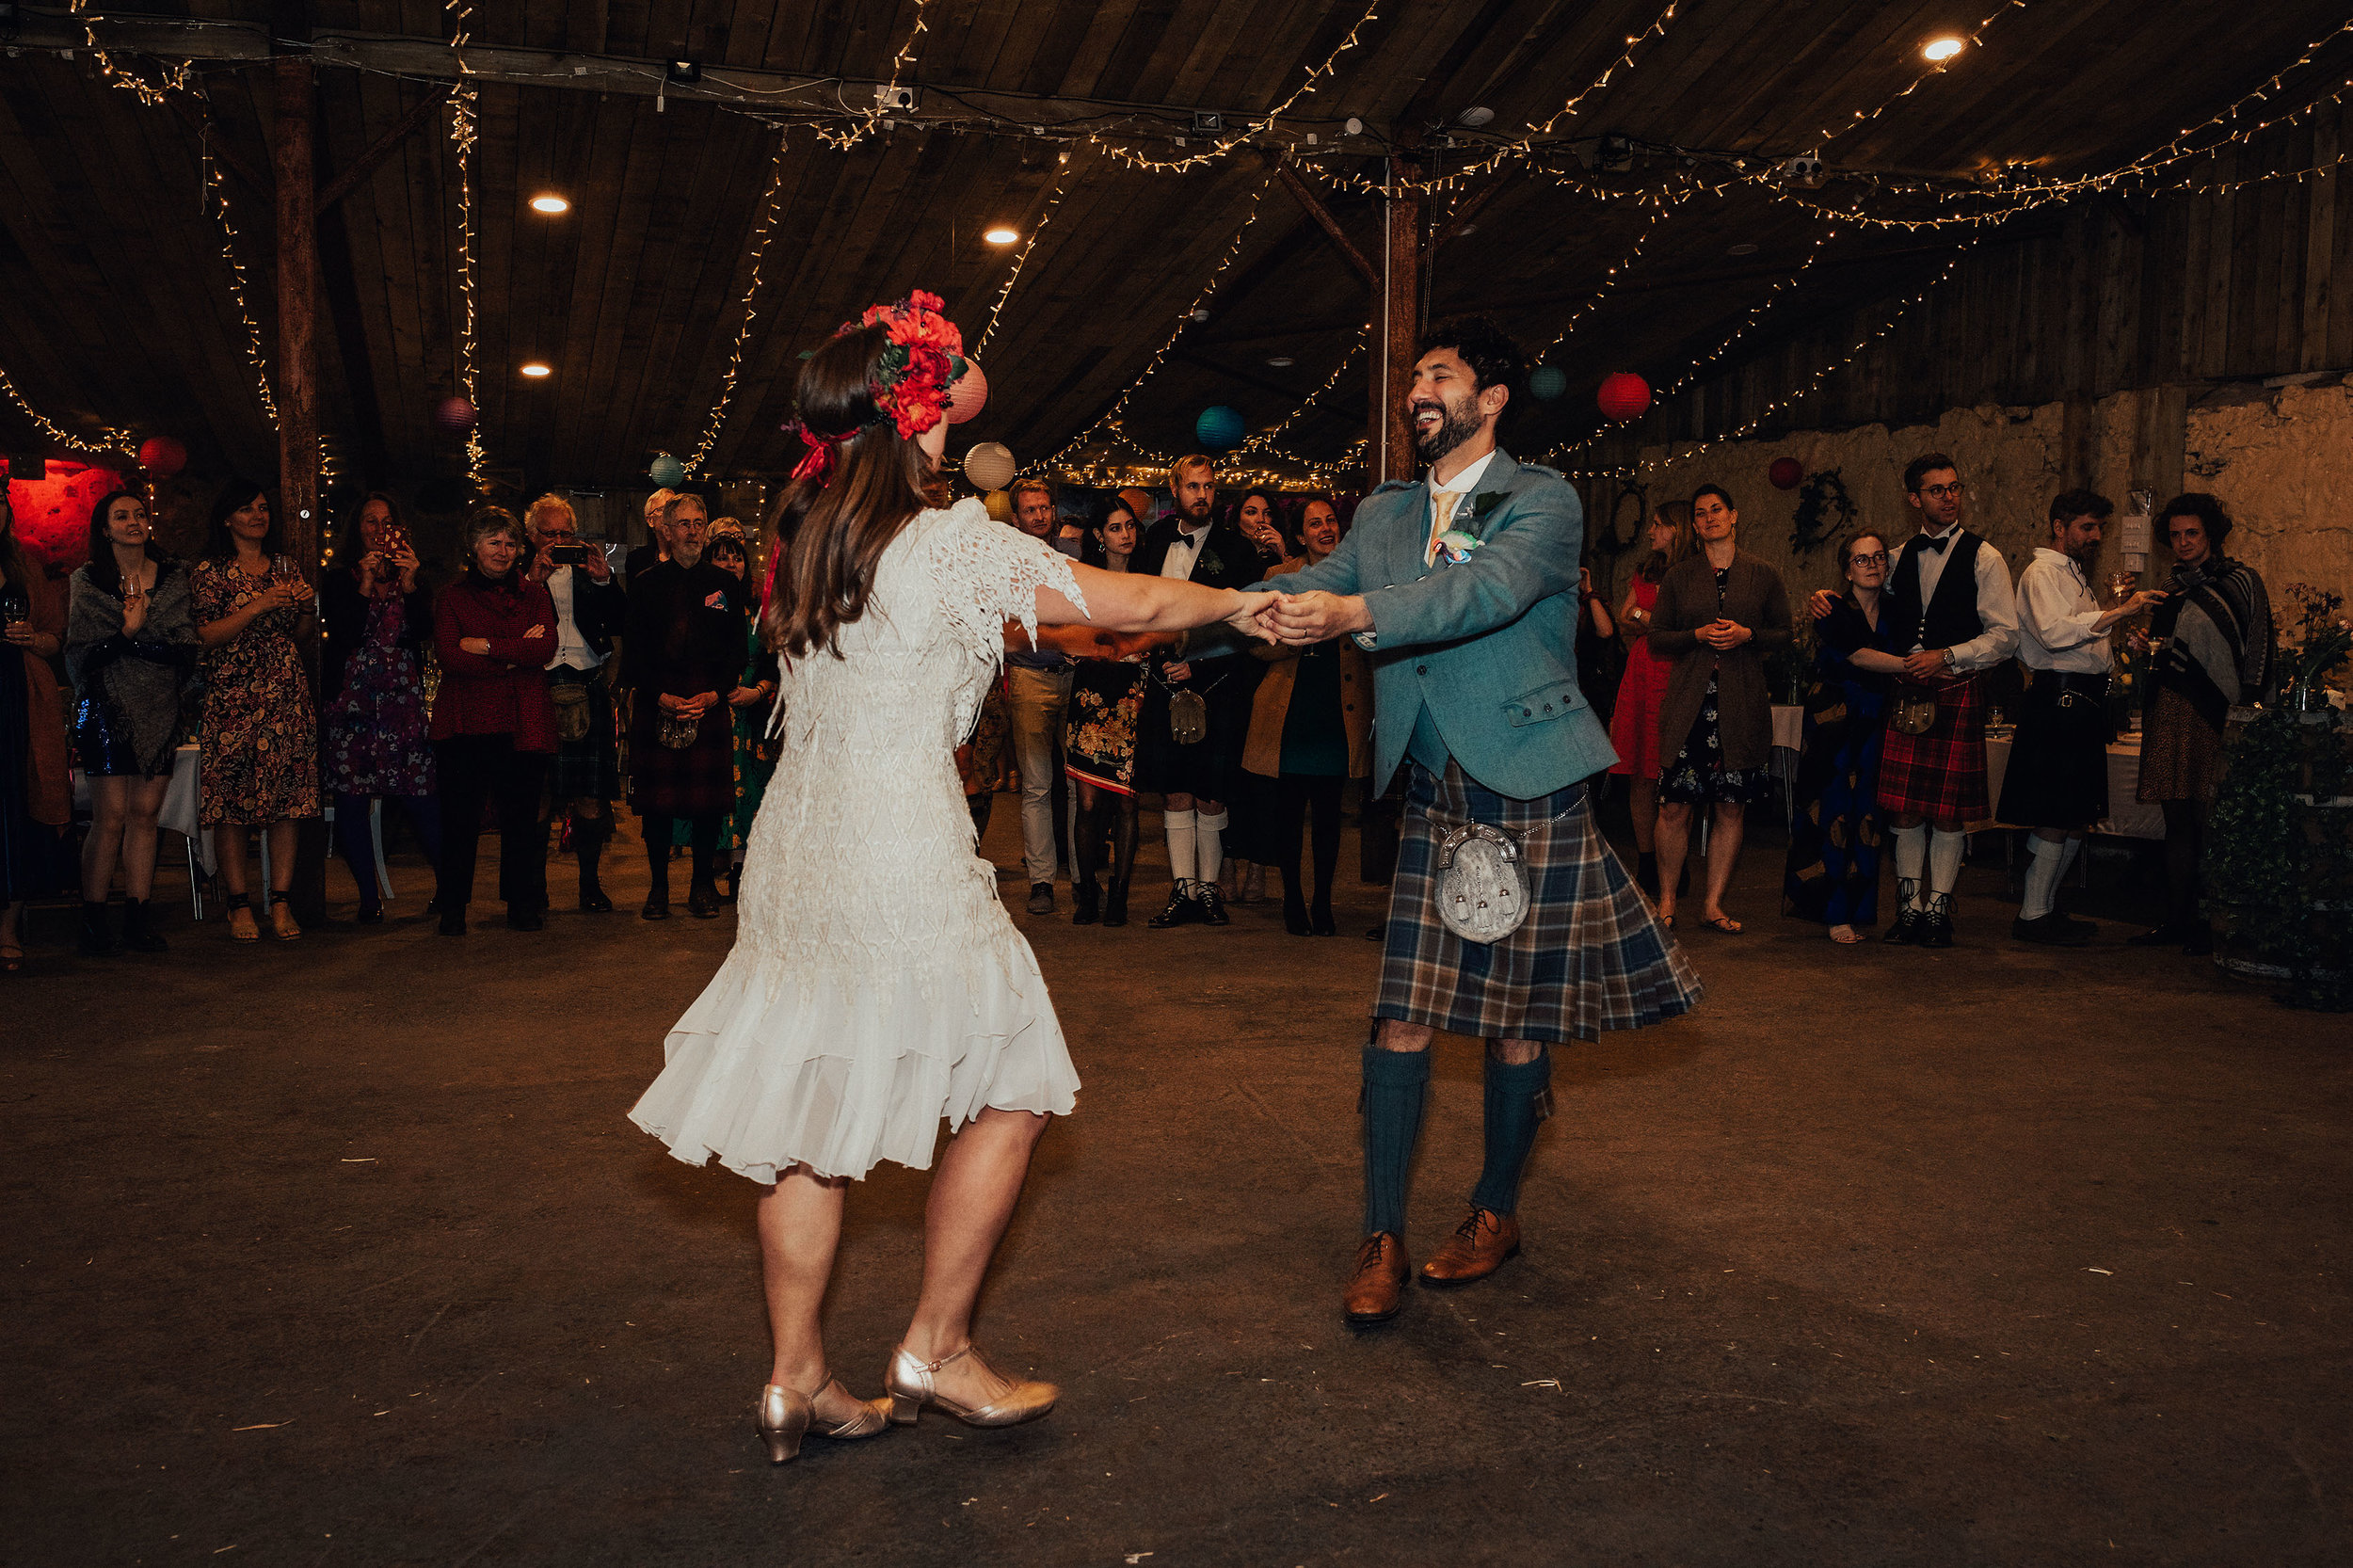 COMRIE_CROFT_WEDDINGS_PJ_PHILLIPS_PHOTOGRAPHY_168.jpg